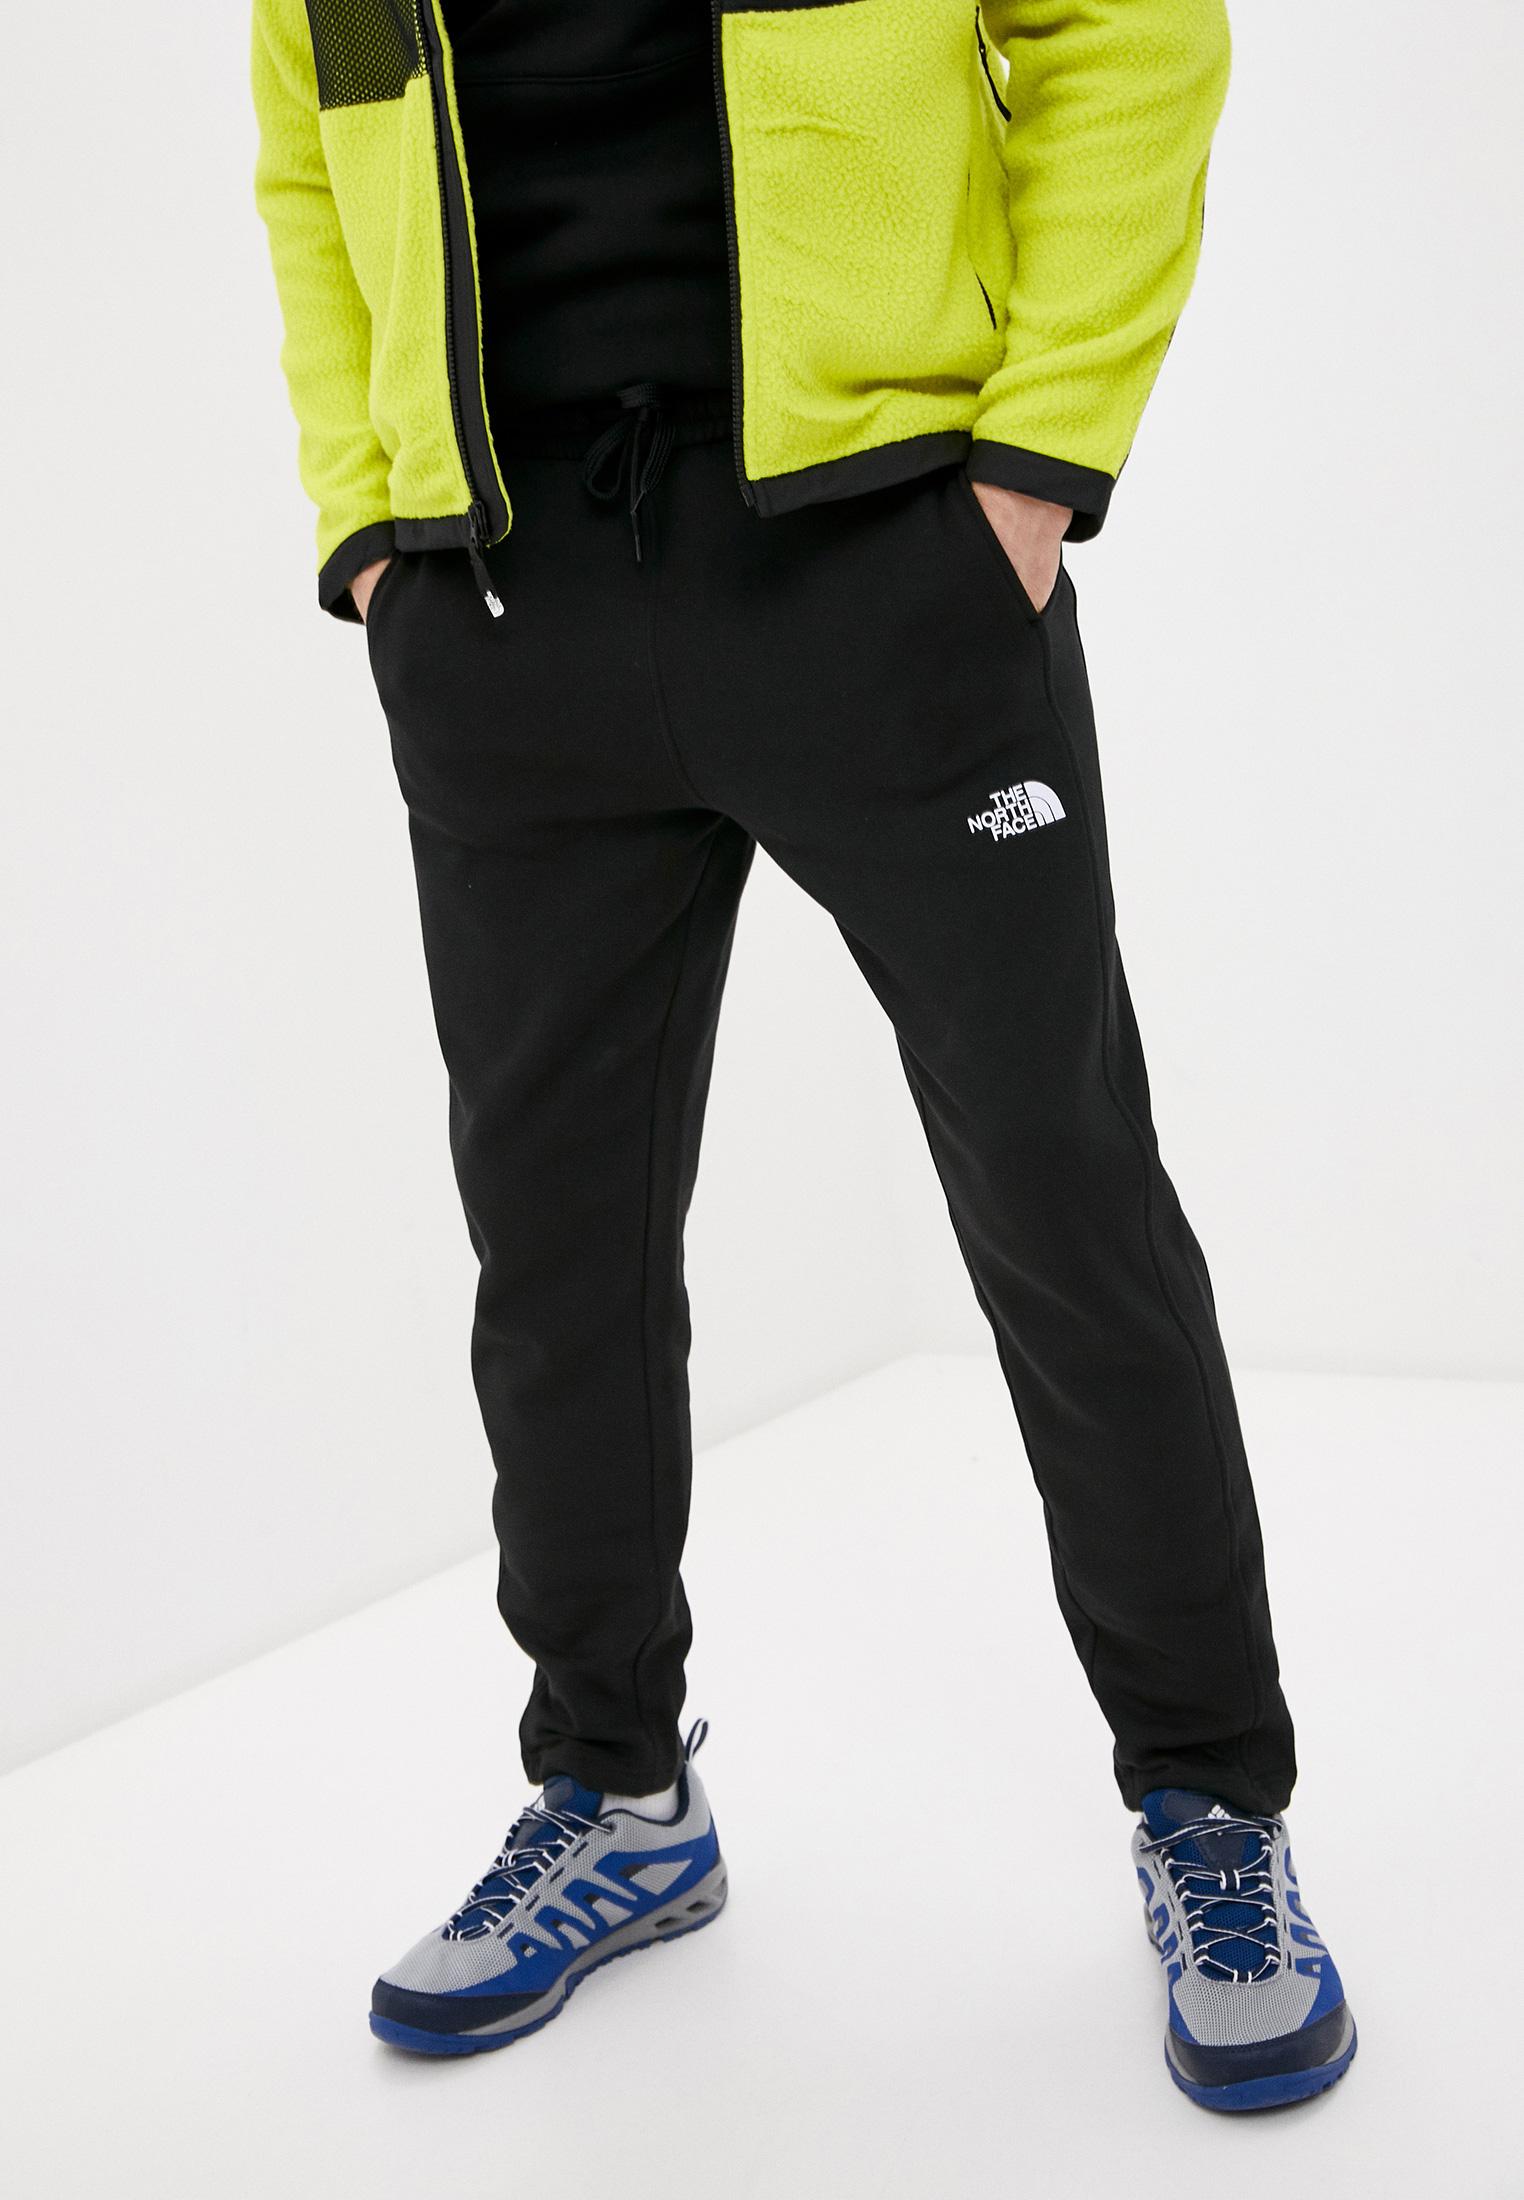 Мужские спортивные брюки The North Face (Норт Фейс) TA4M7L